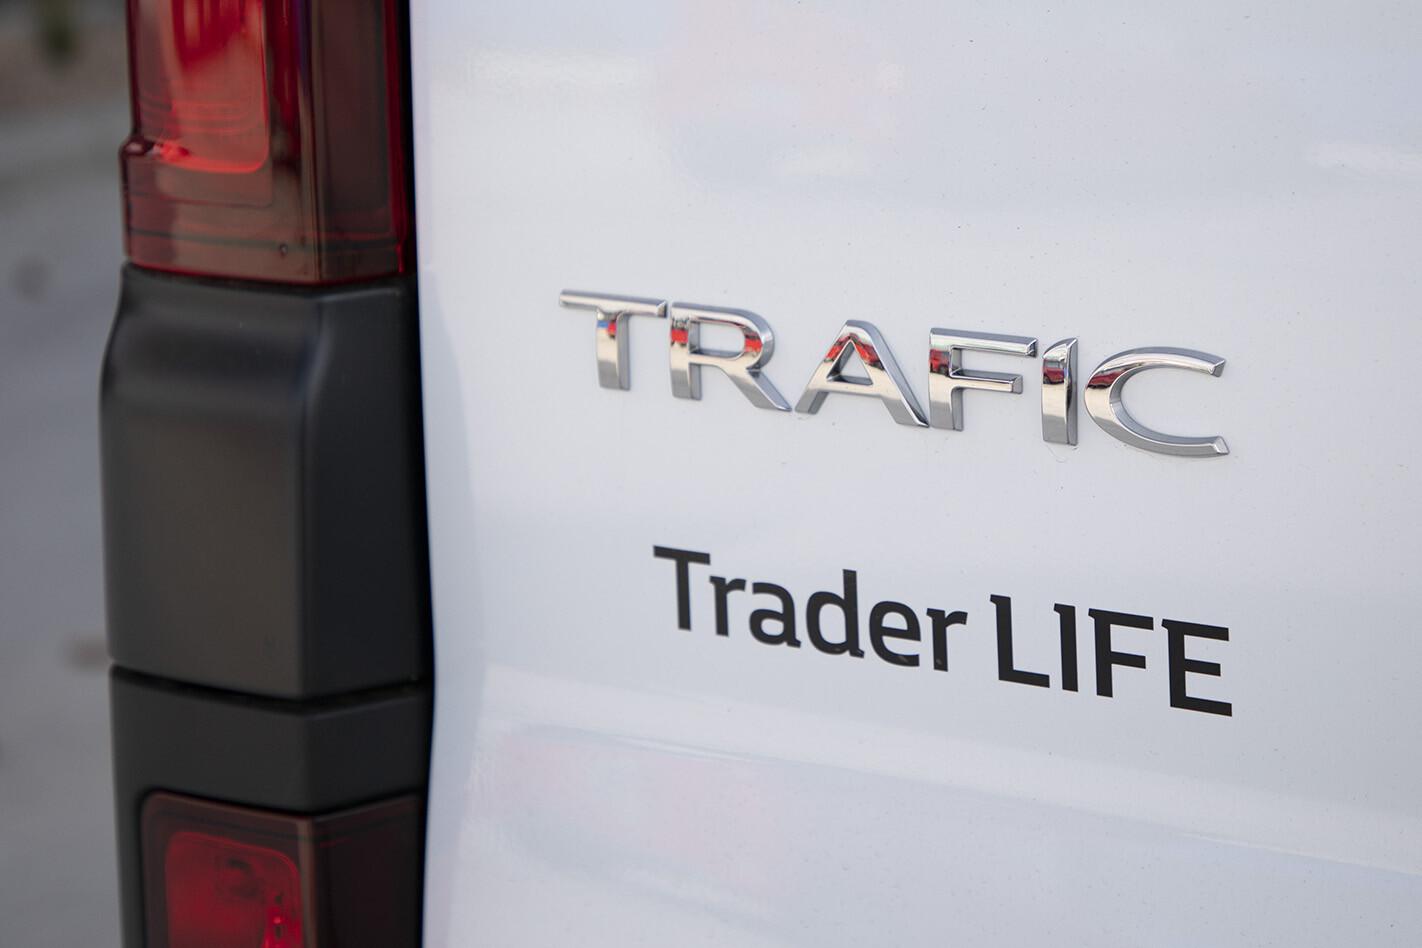 2019 Renault Trafic Traderlife Review Badge Jpg